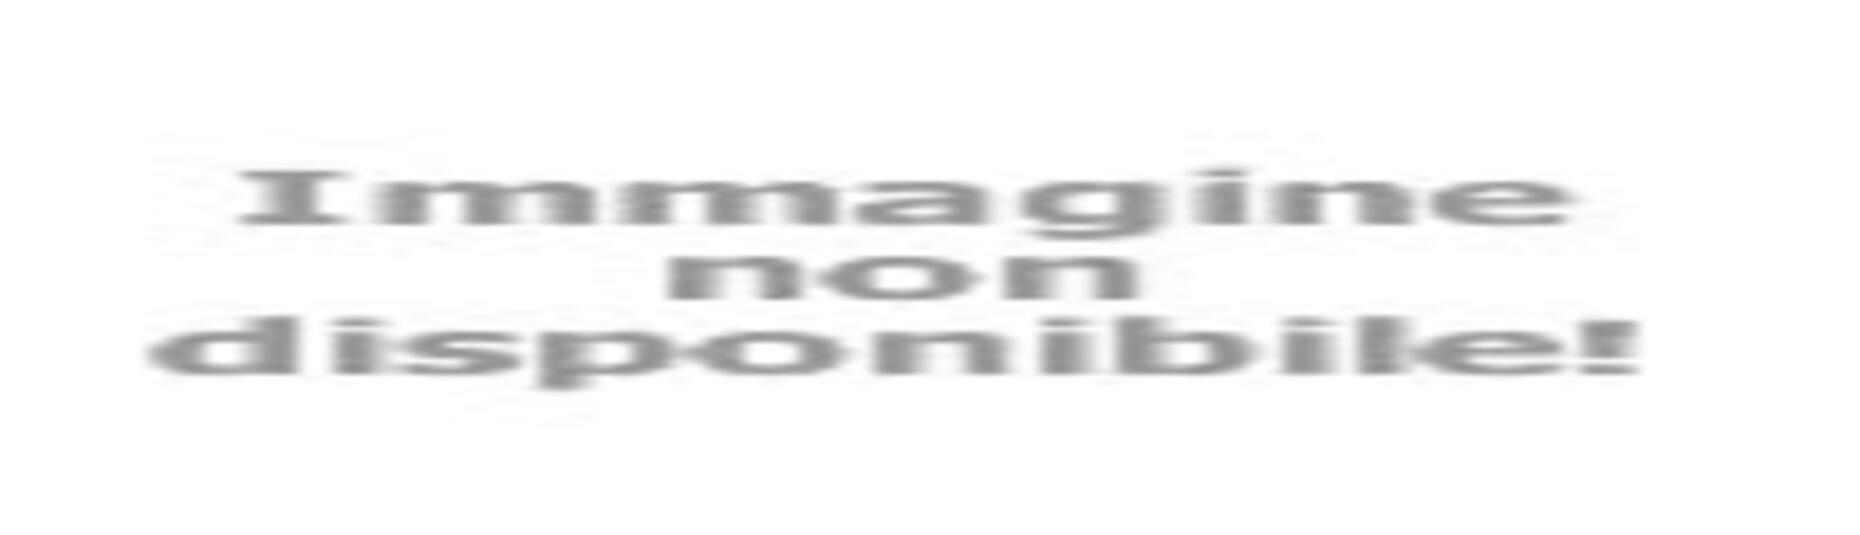 hotelermitage fr experience-hotel-bellaria-animation 011